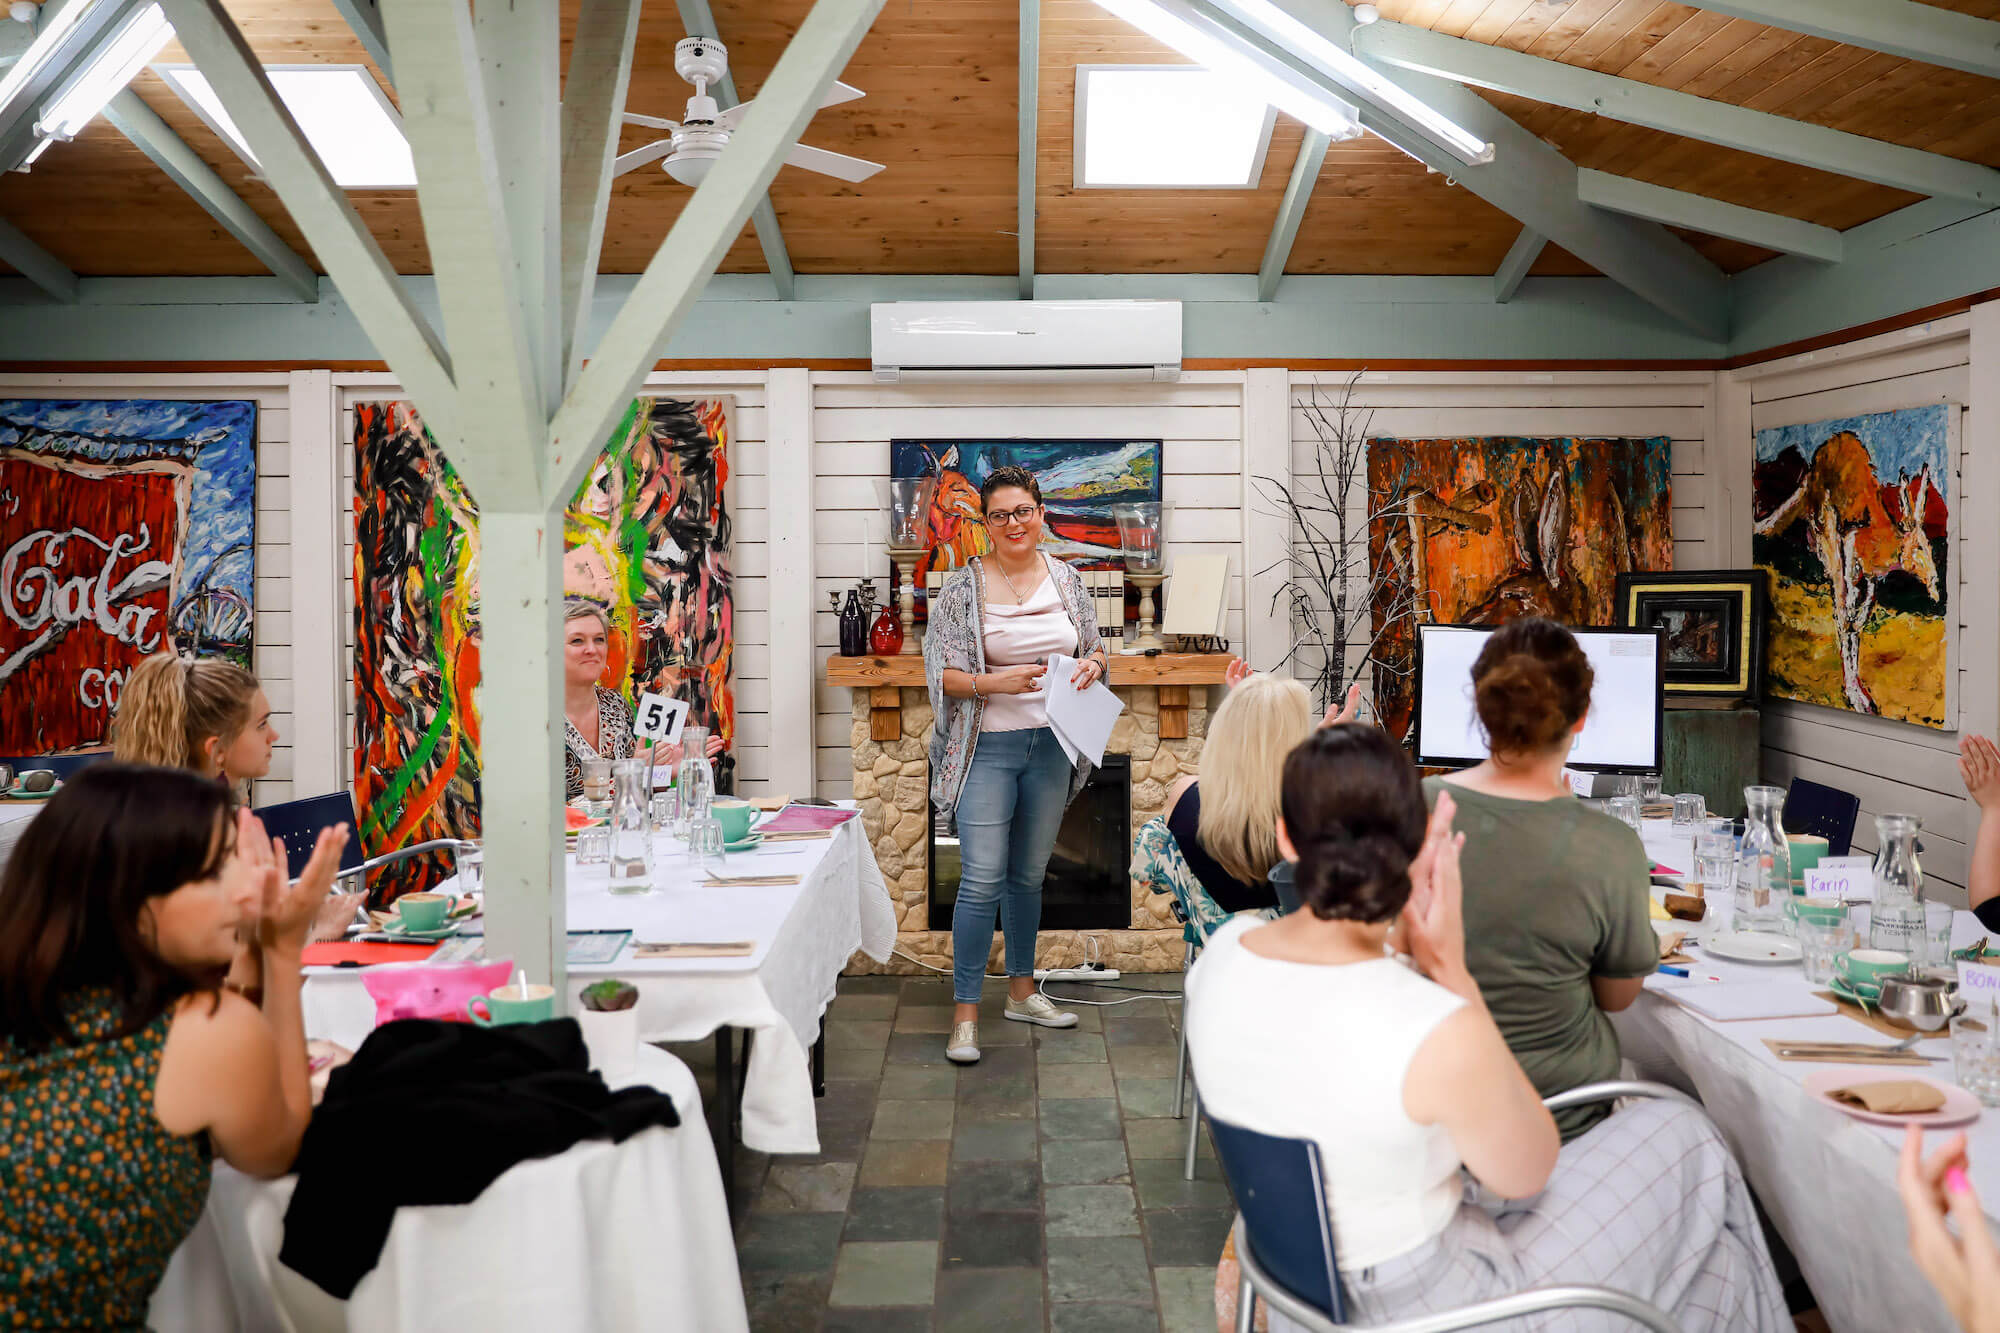 Patricia autism workshops australia